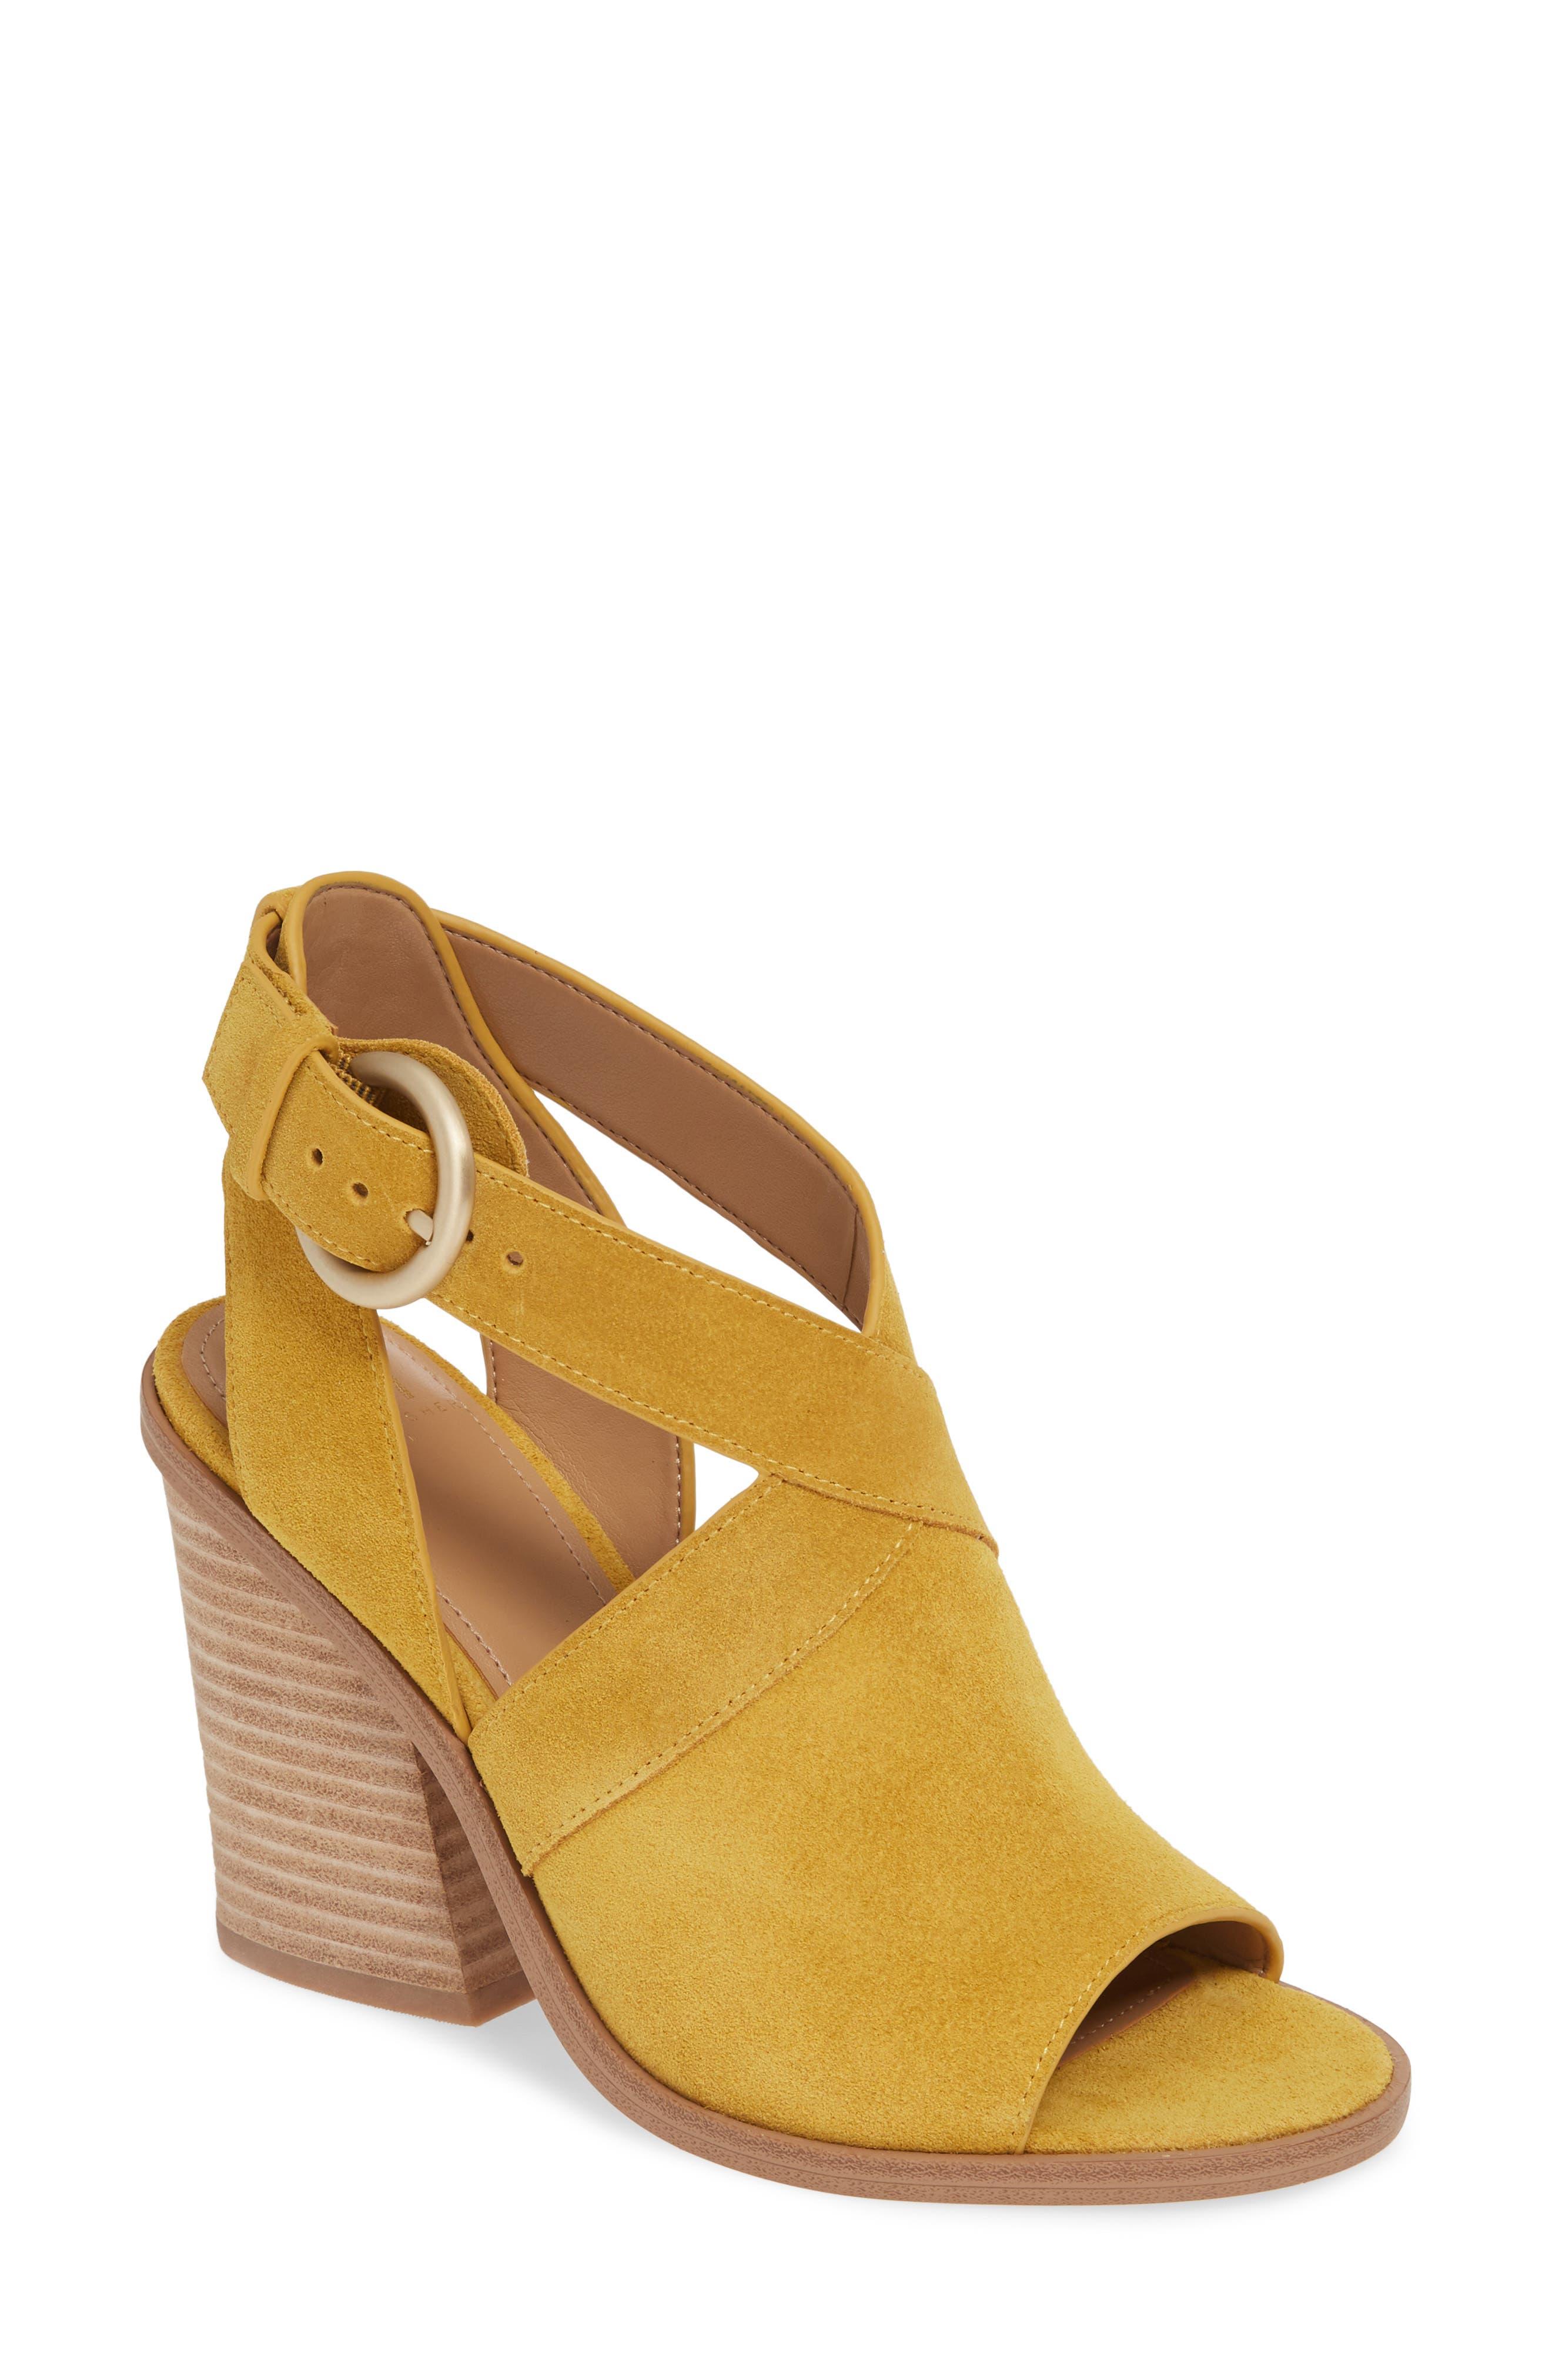 a874d5bd0c5 Buy marc fisher ltd sandals for women - Best women's marc fisher ltd ...